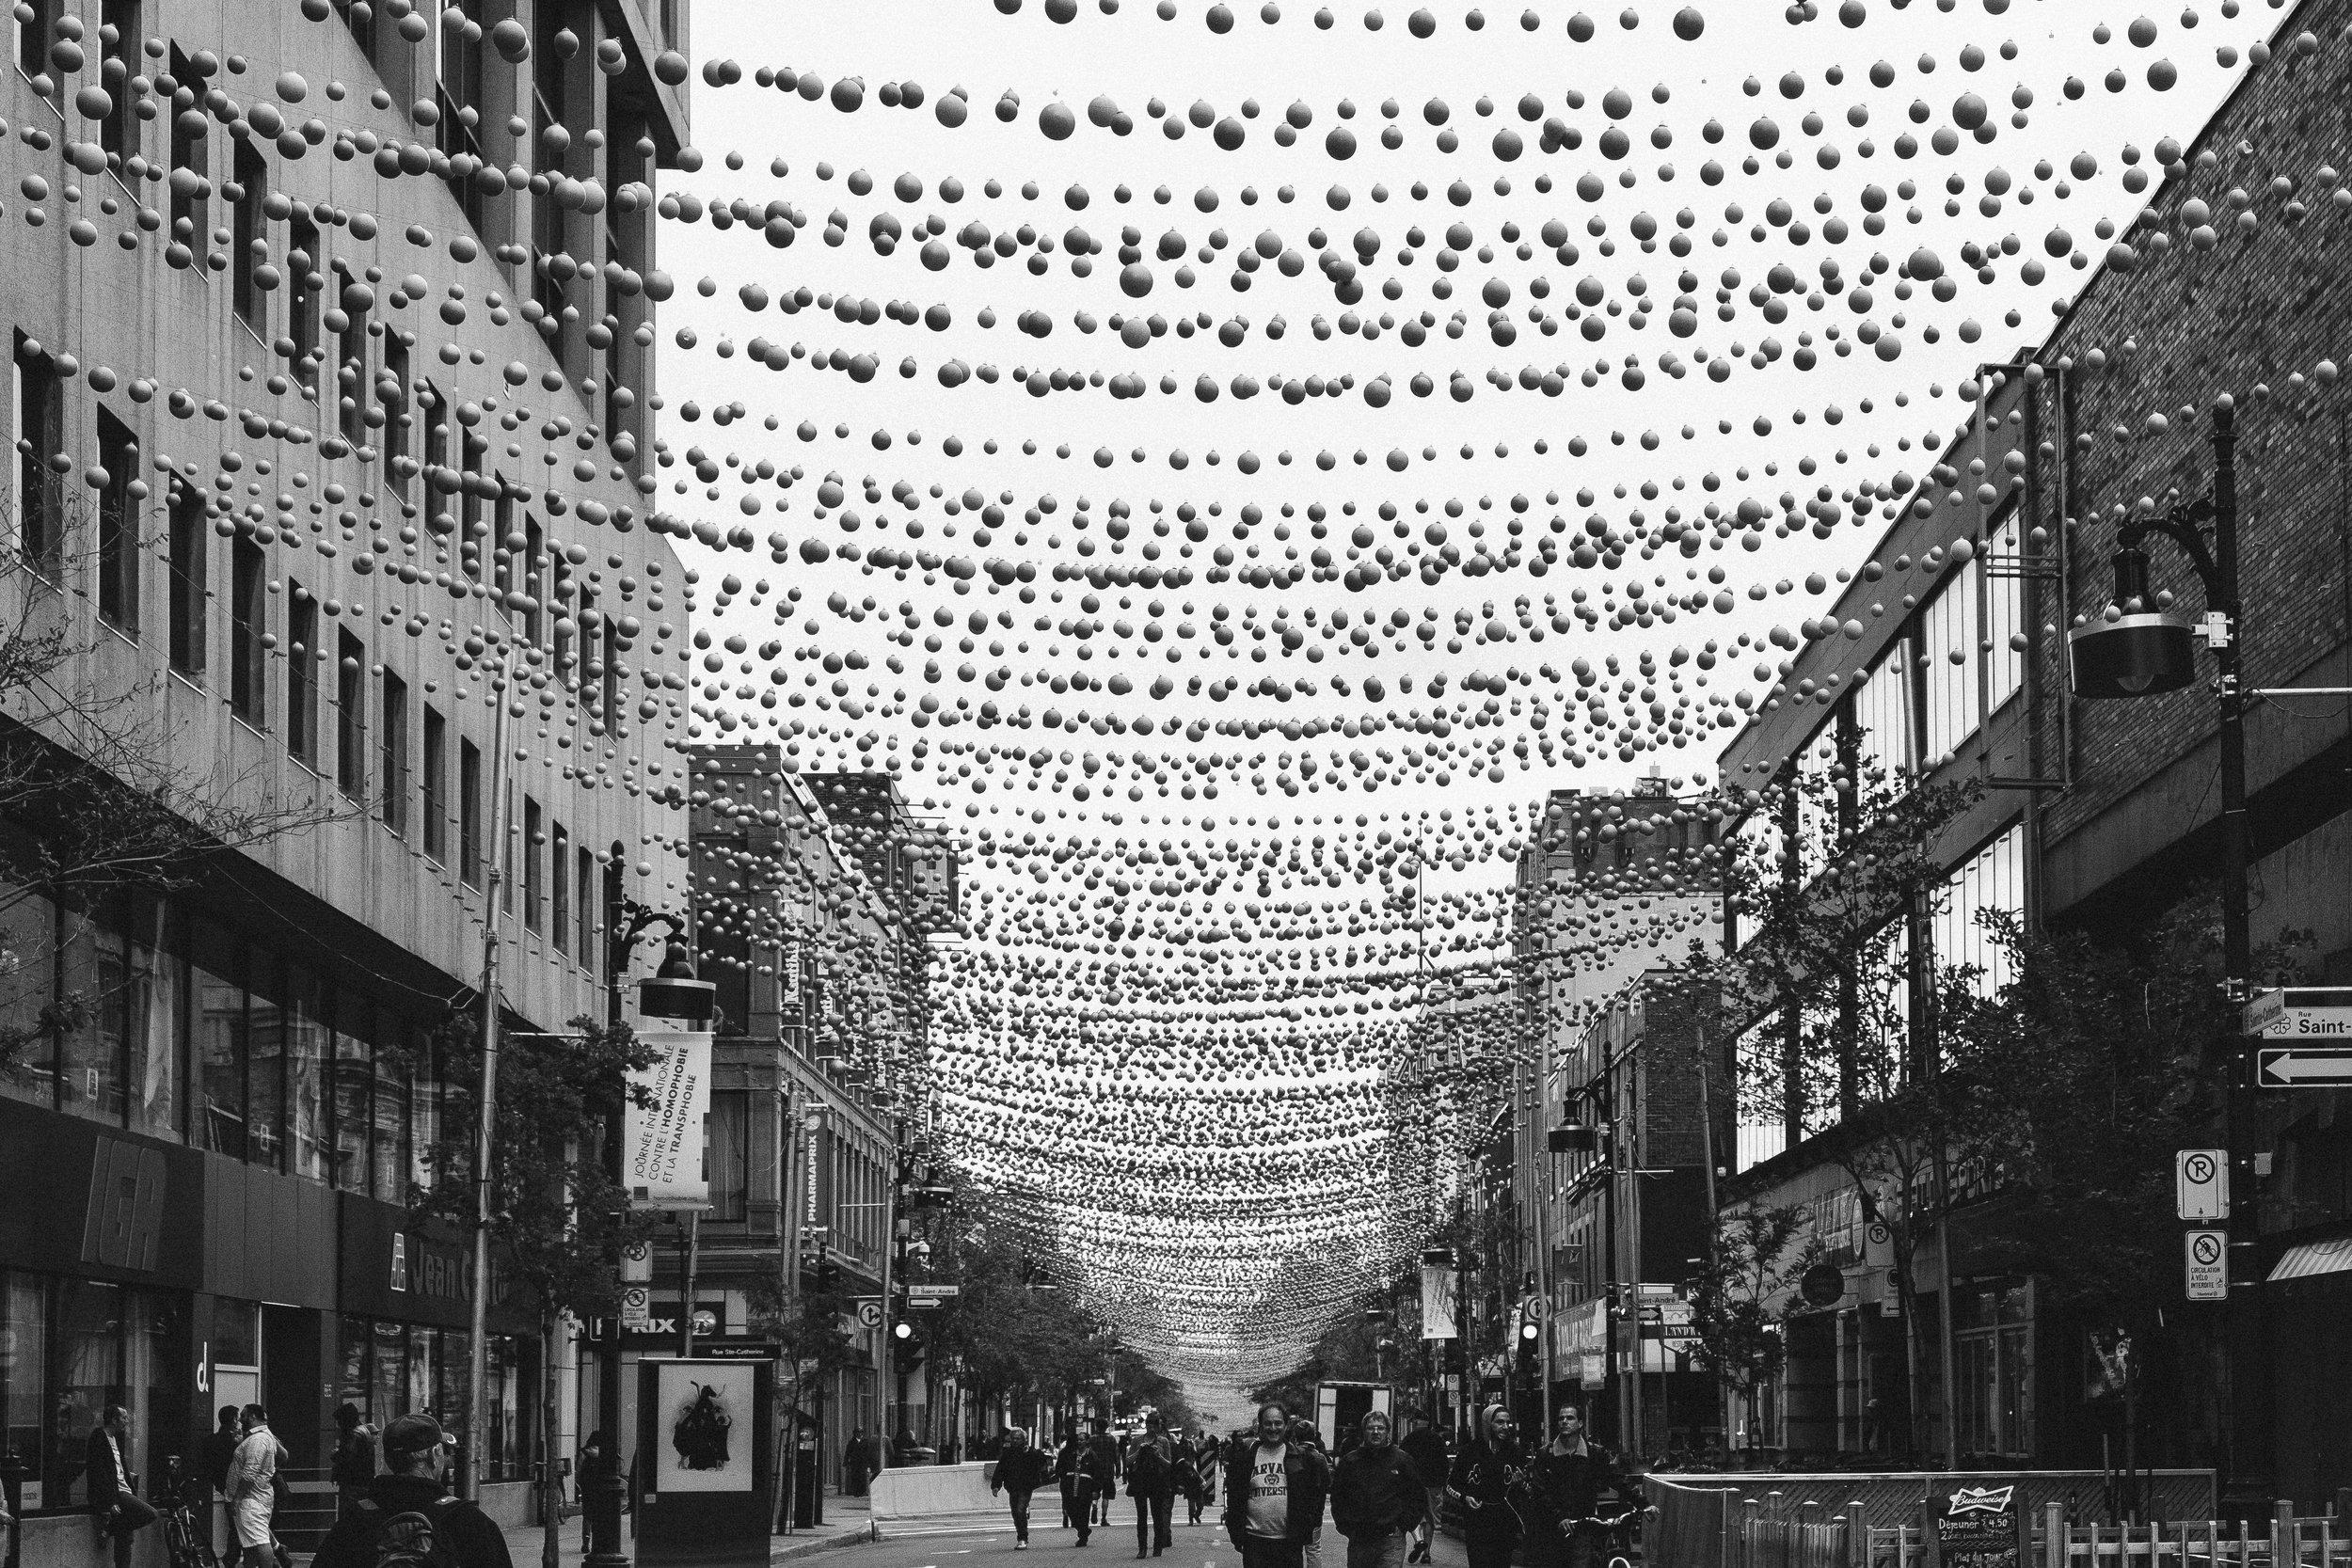 Rue St. Catherine B+W.jpg